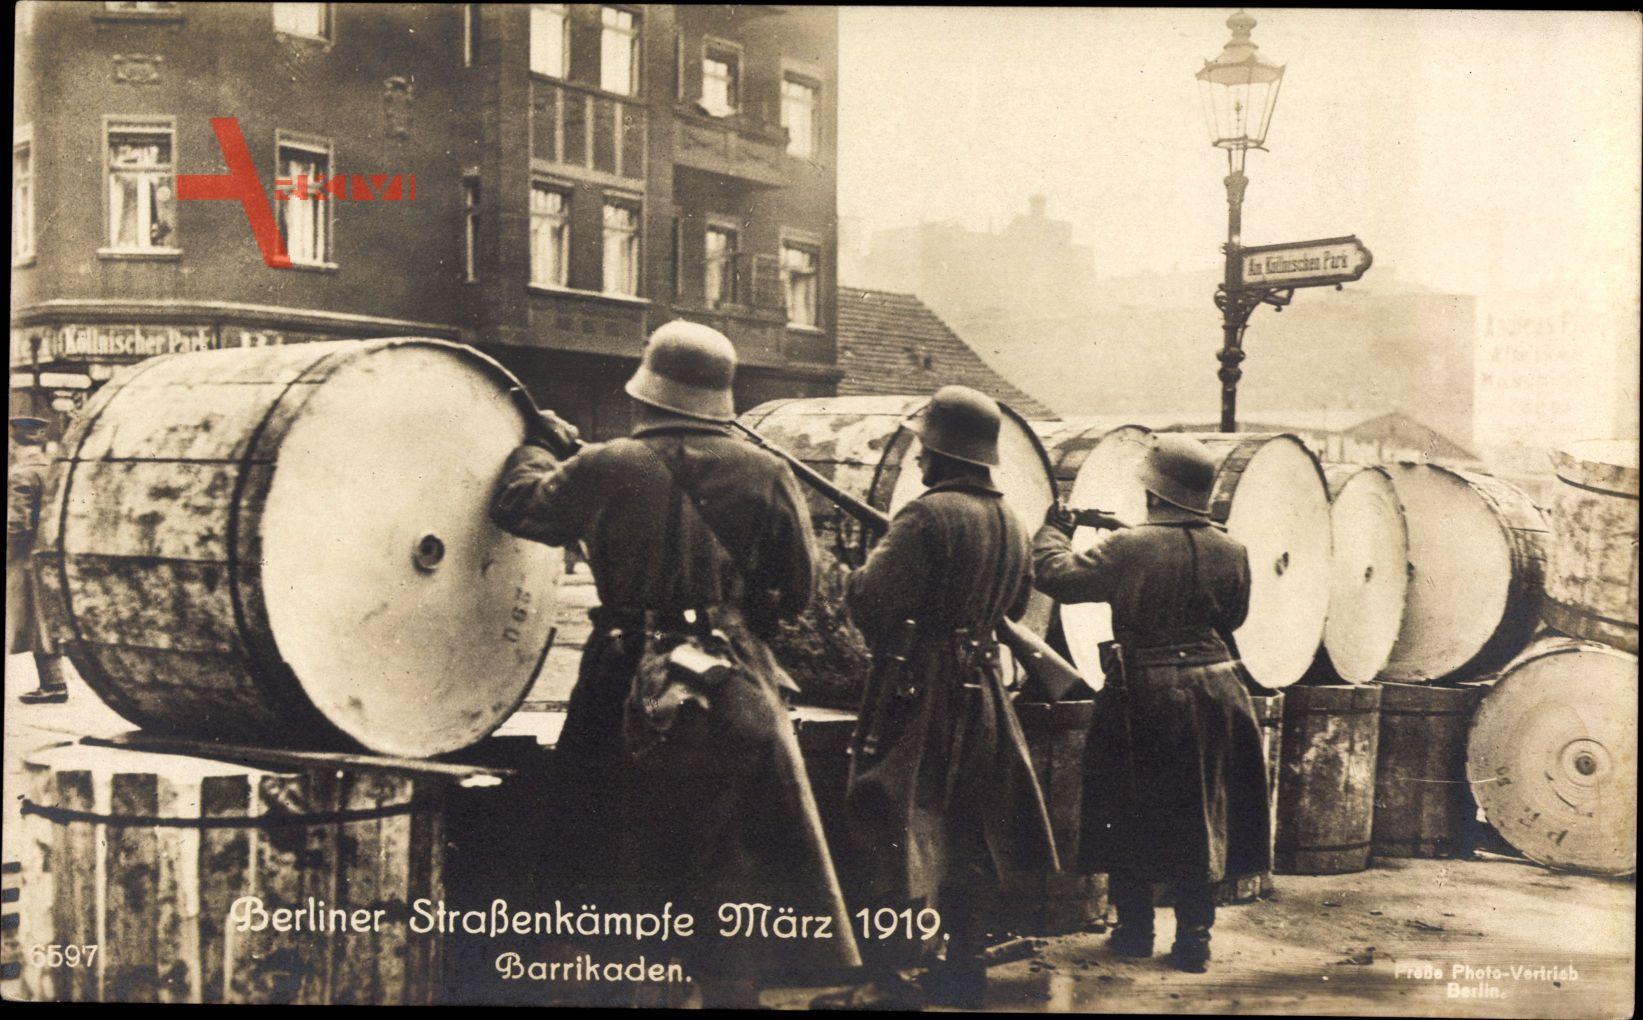 Berlin, Straßenkämpfe, März 1919, Barrikaden, Soldaten, Am Köllnischen Park